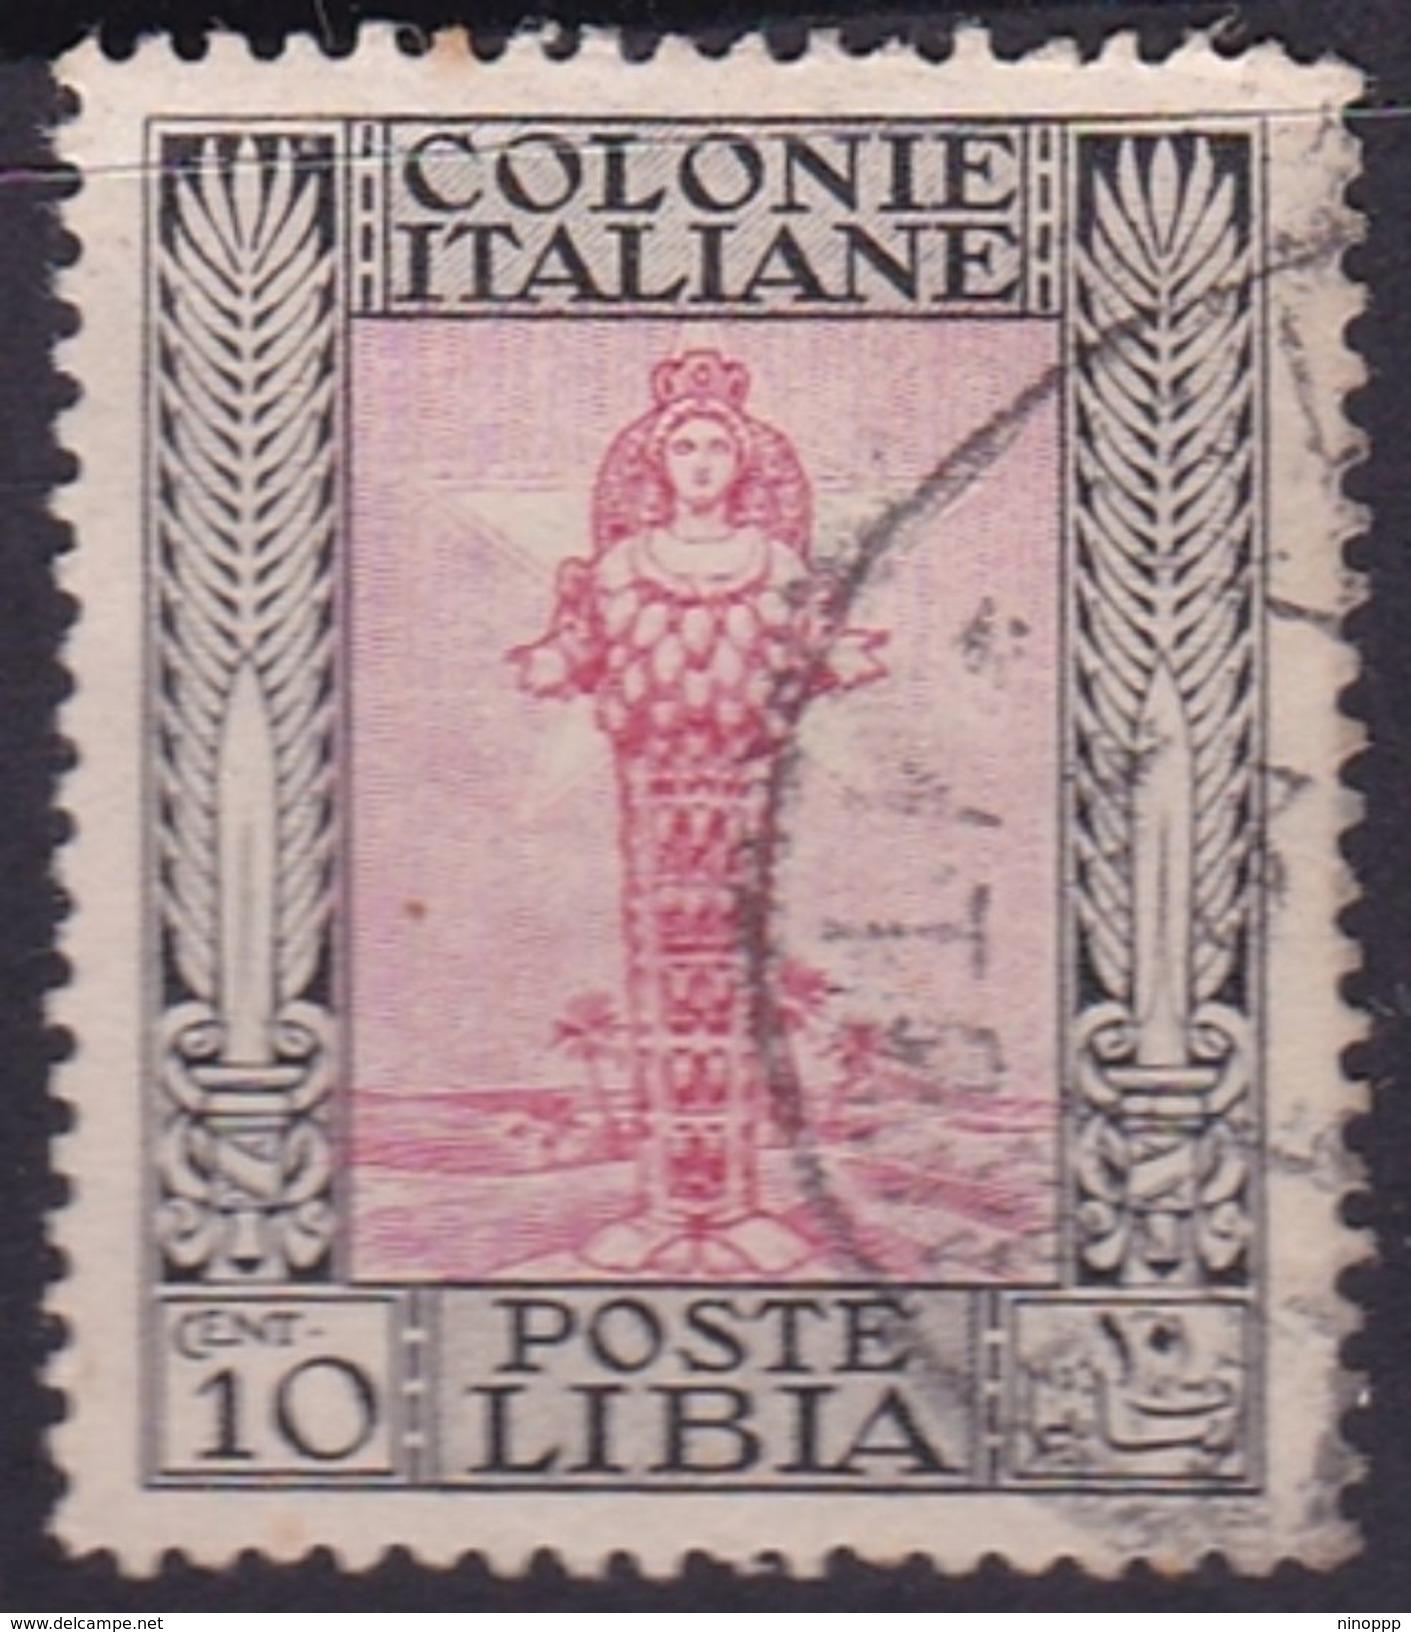 Italy-Colonies And Territories-Libya S 47 1924-29 ,Pictorials No Watermark,10c Diana Of Ephesus,used - Libya